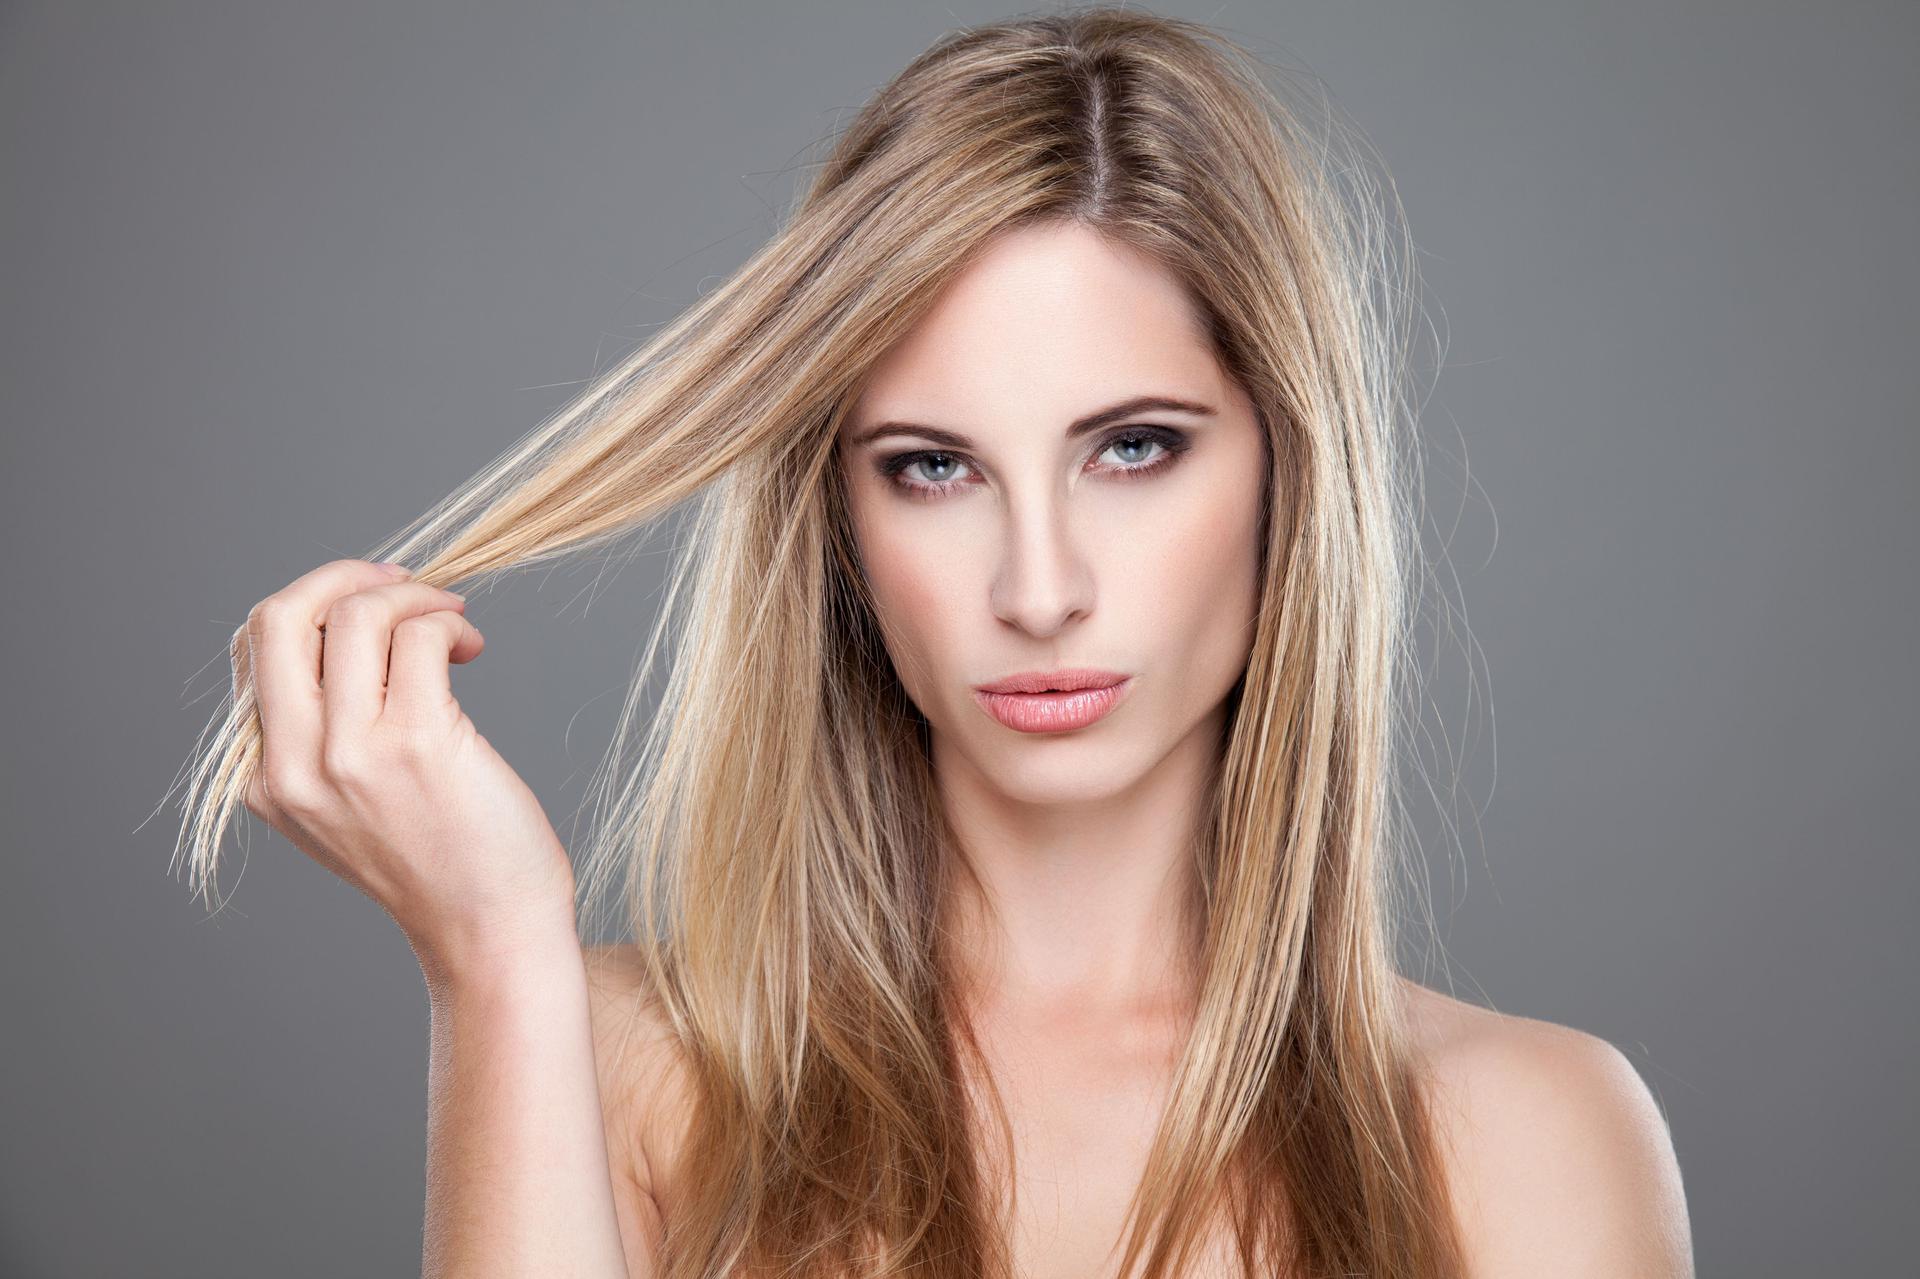 Refleksy Na Włosach Jak Je Zrobić Refleksy A Pasemka